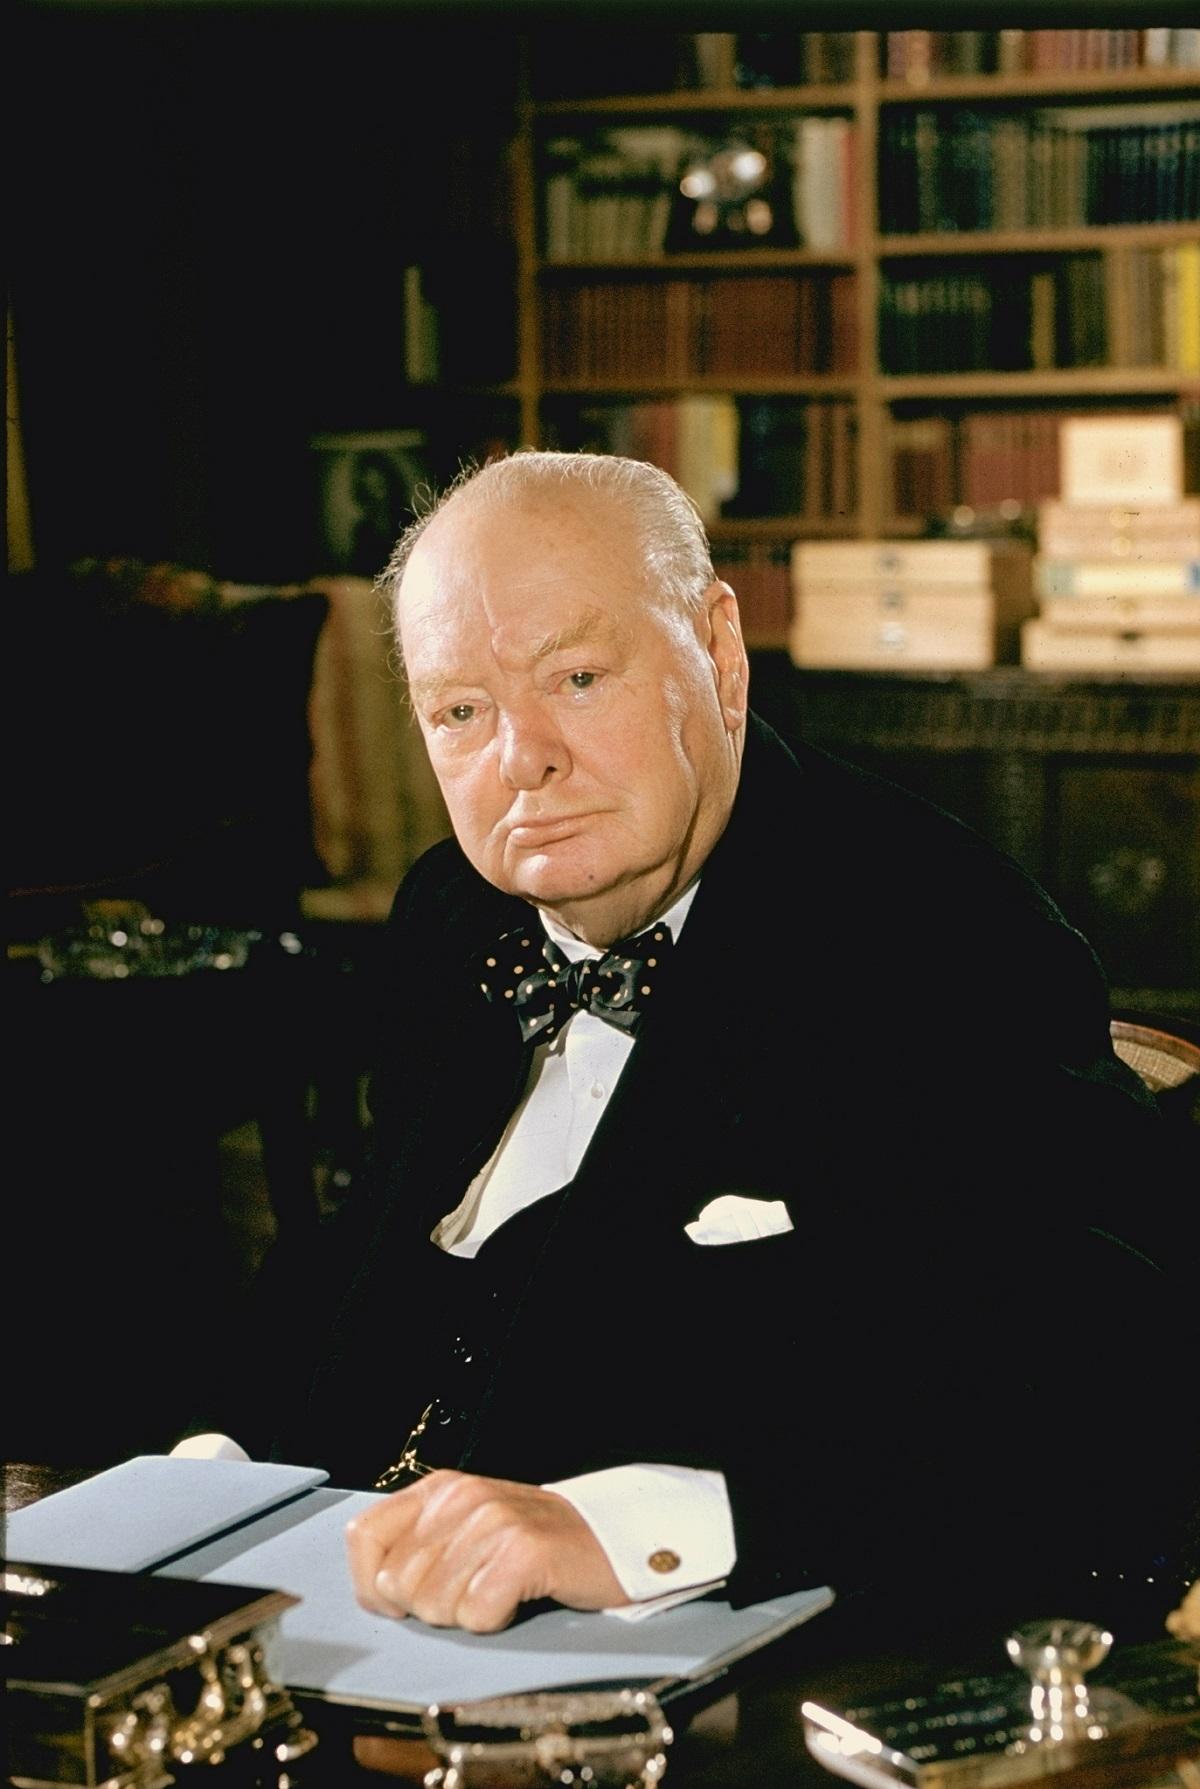 Formal portrait of Sir Winston Churchill at his desk